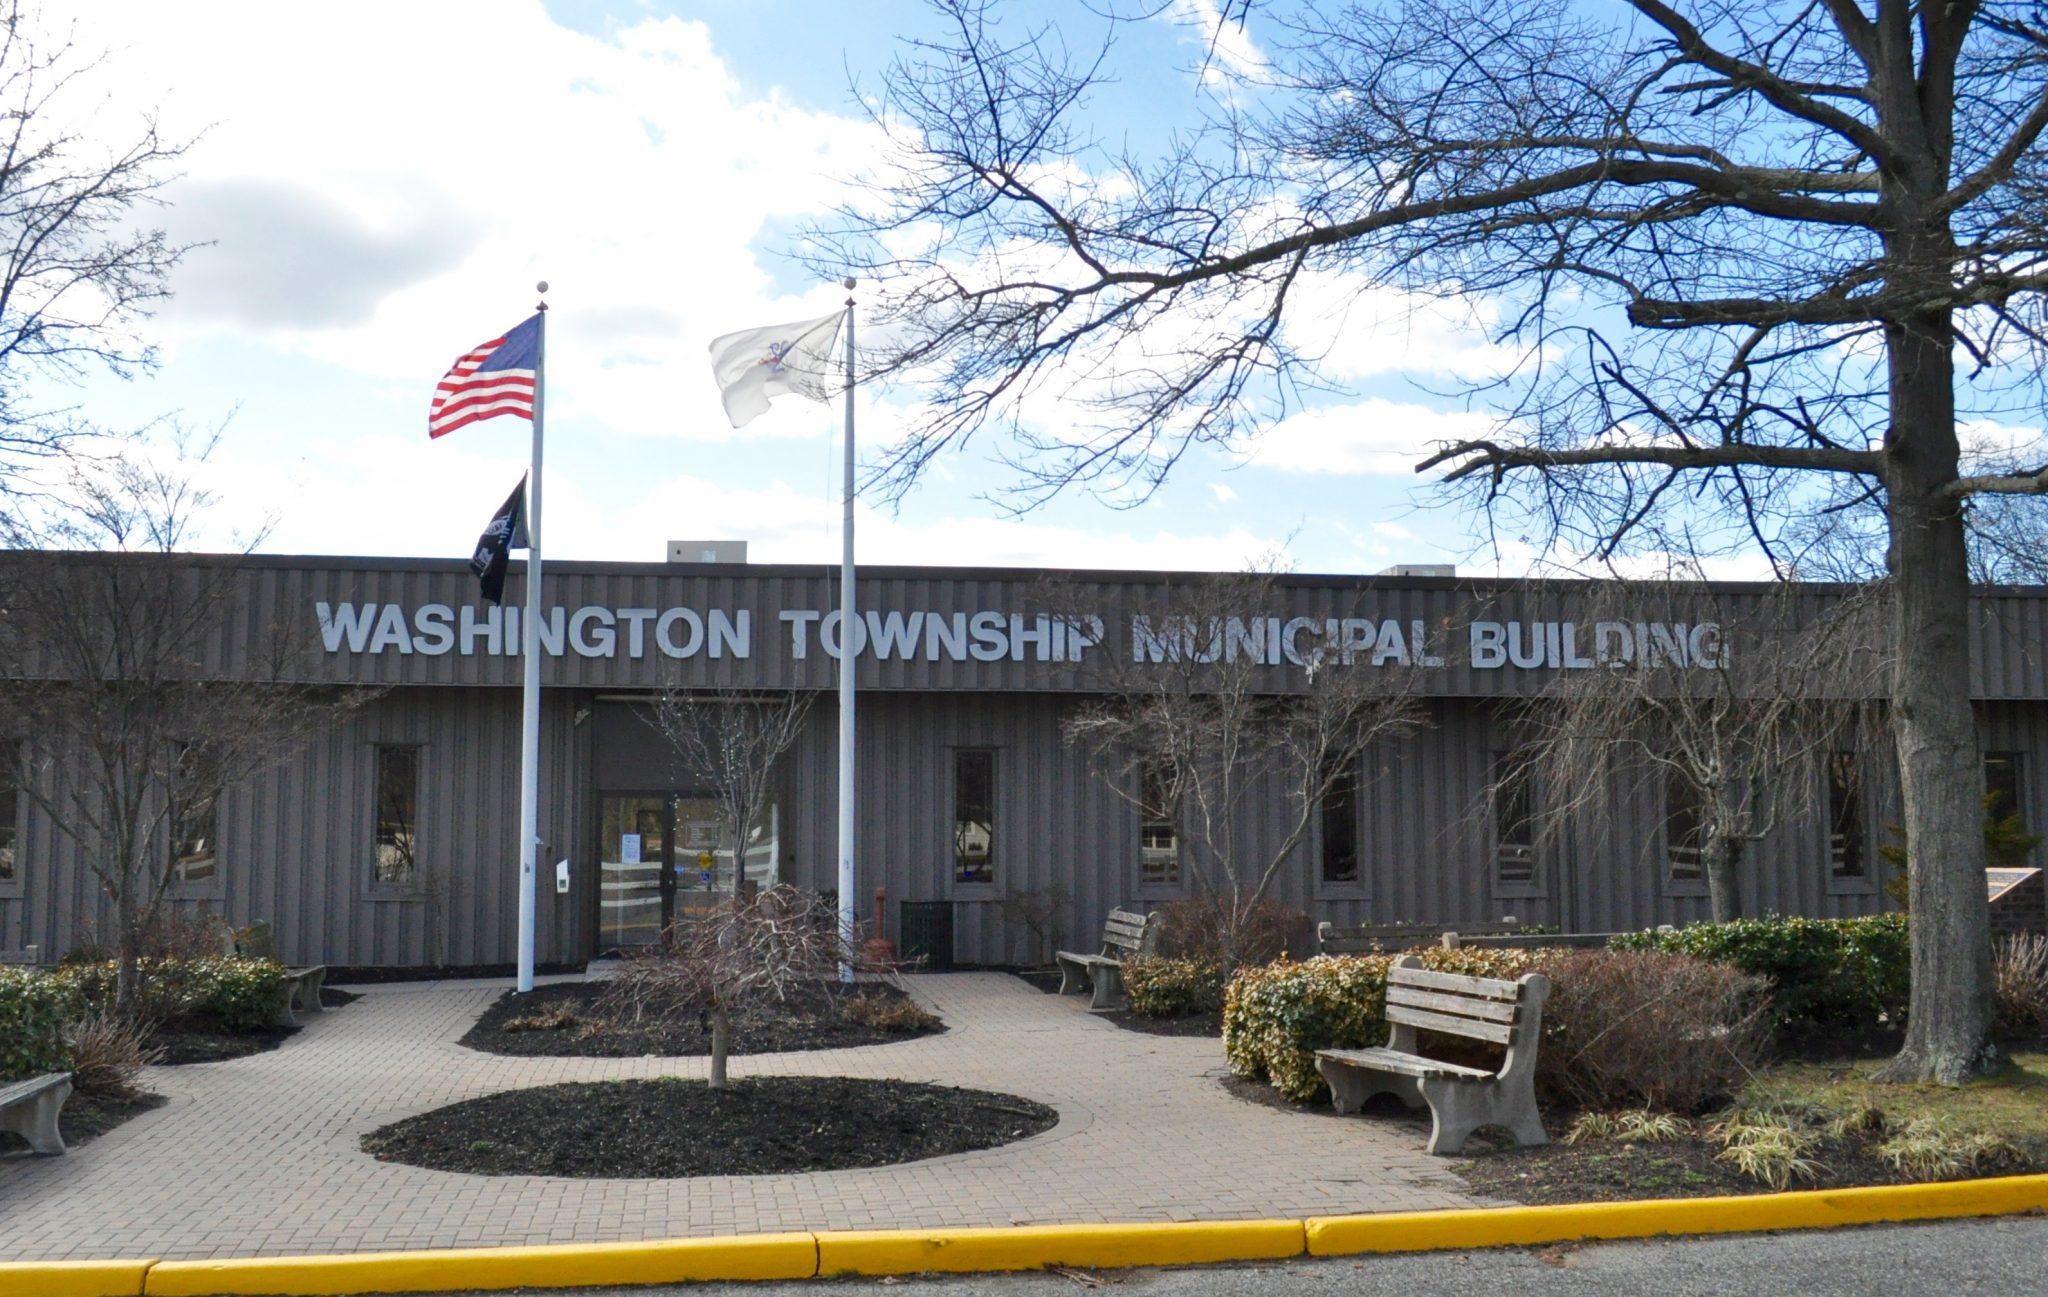 AIR DUCT CLEANING Washington Township MICHIGAN